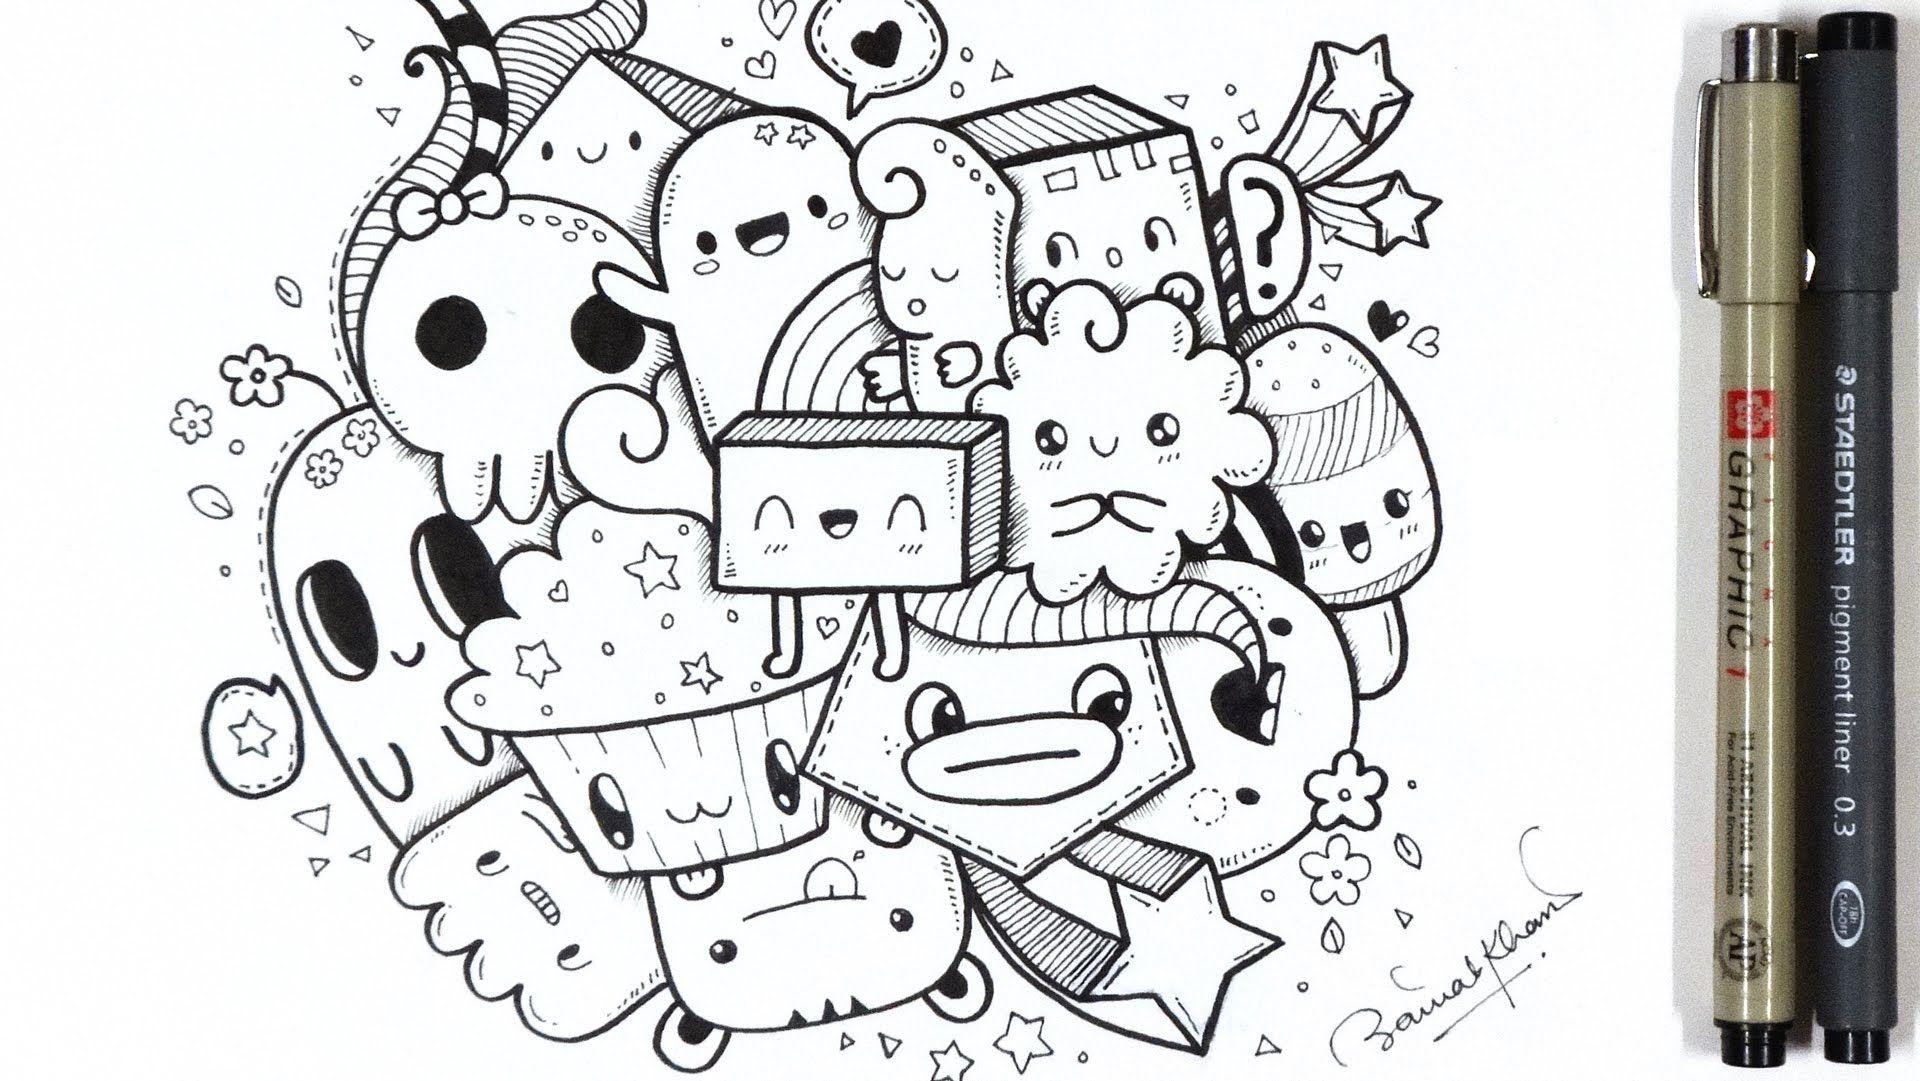 A Quick Kawaii Doodle Www Youtube Com Piccandle Com Imagens